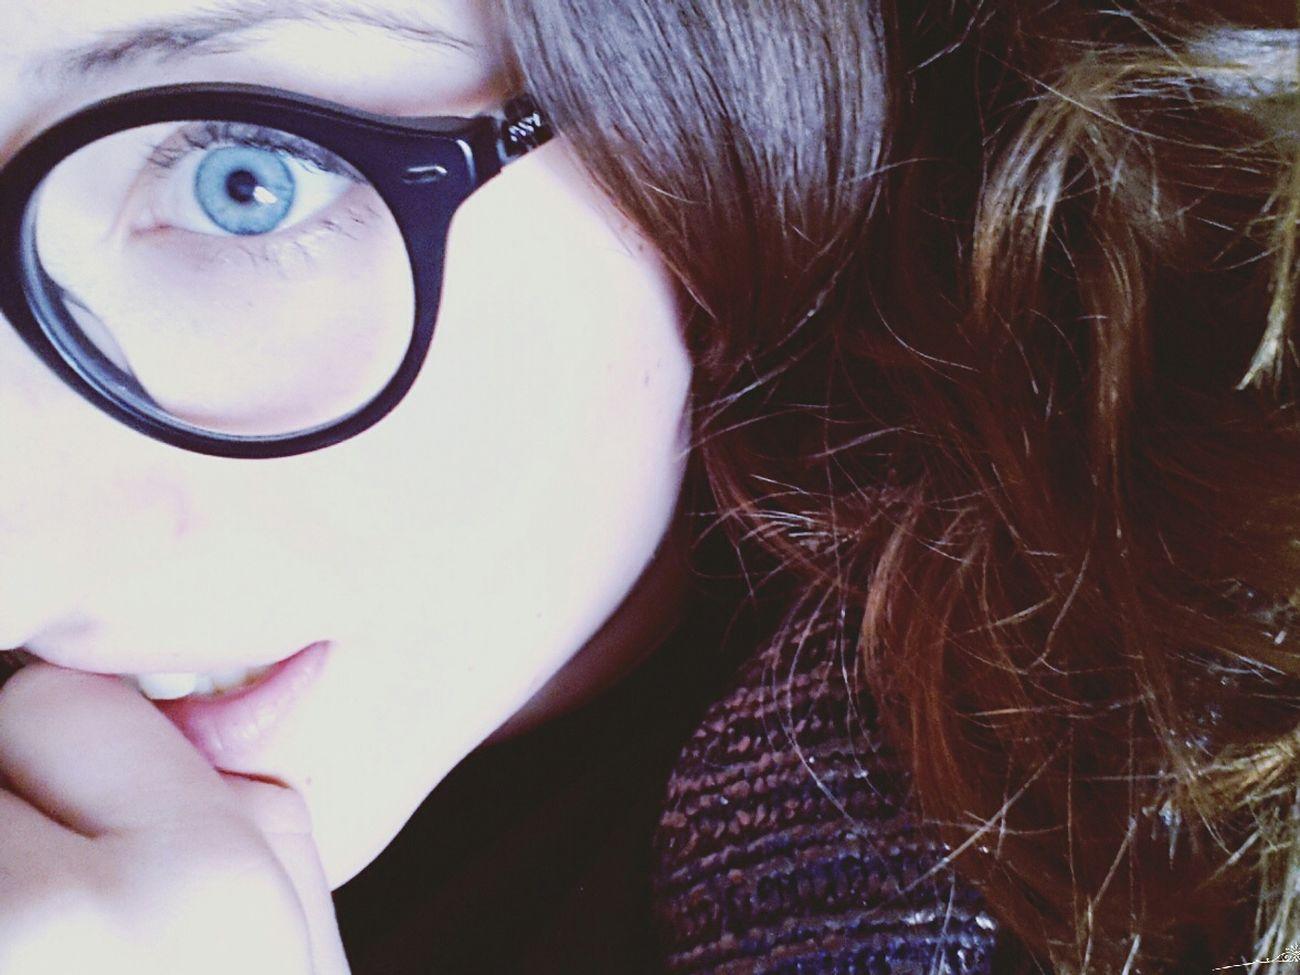 Kik: loris133 i'm boooooooored, so sooo bored. No filter. Eyes Me Relaxing Studying Helpme Kisses Babies 😍???